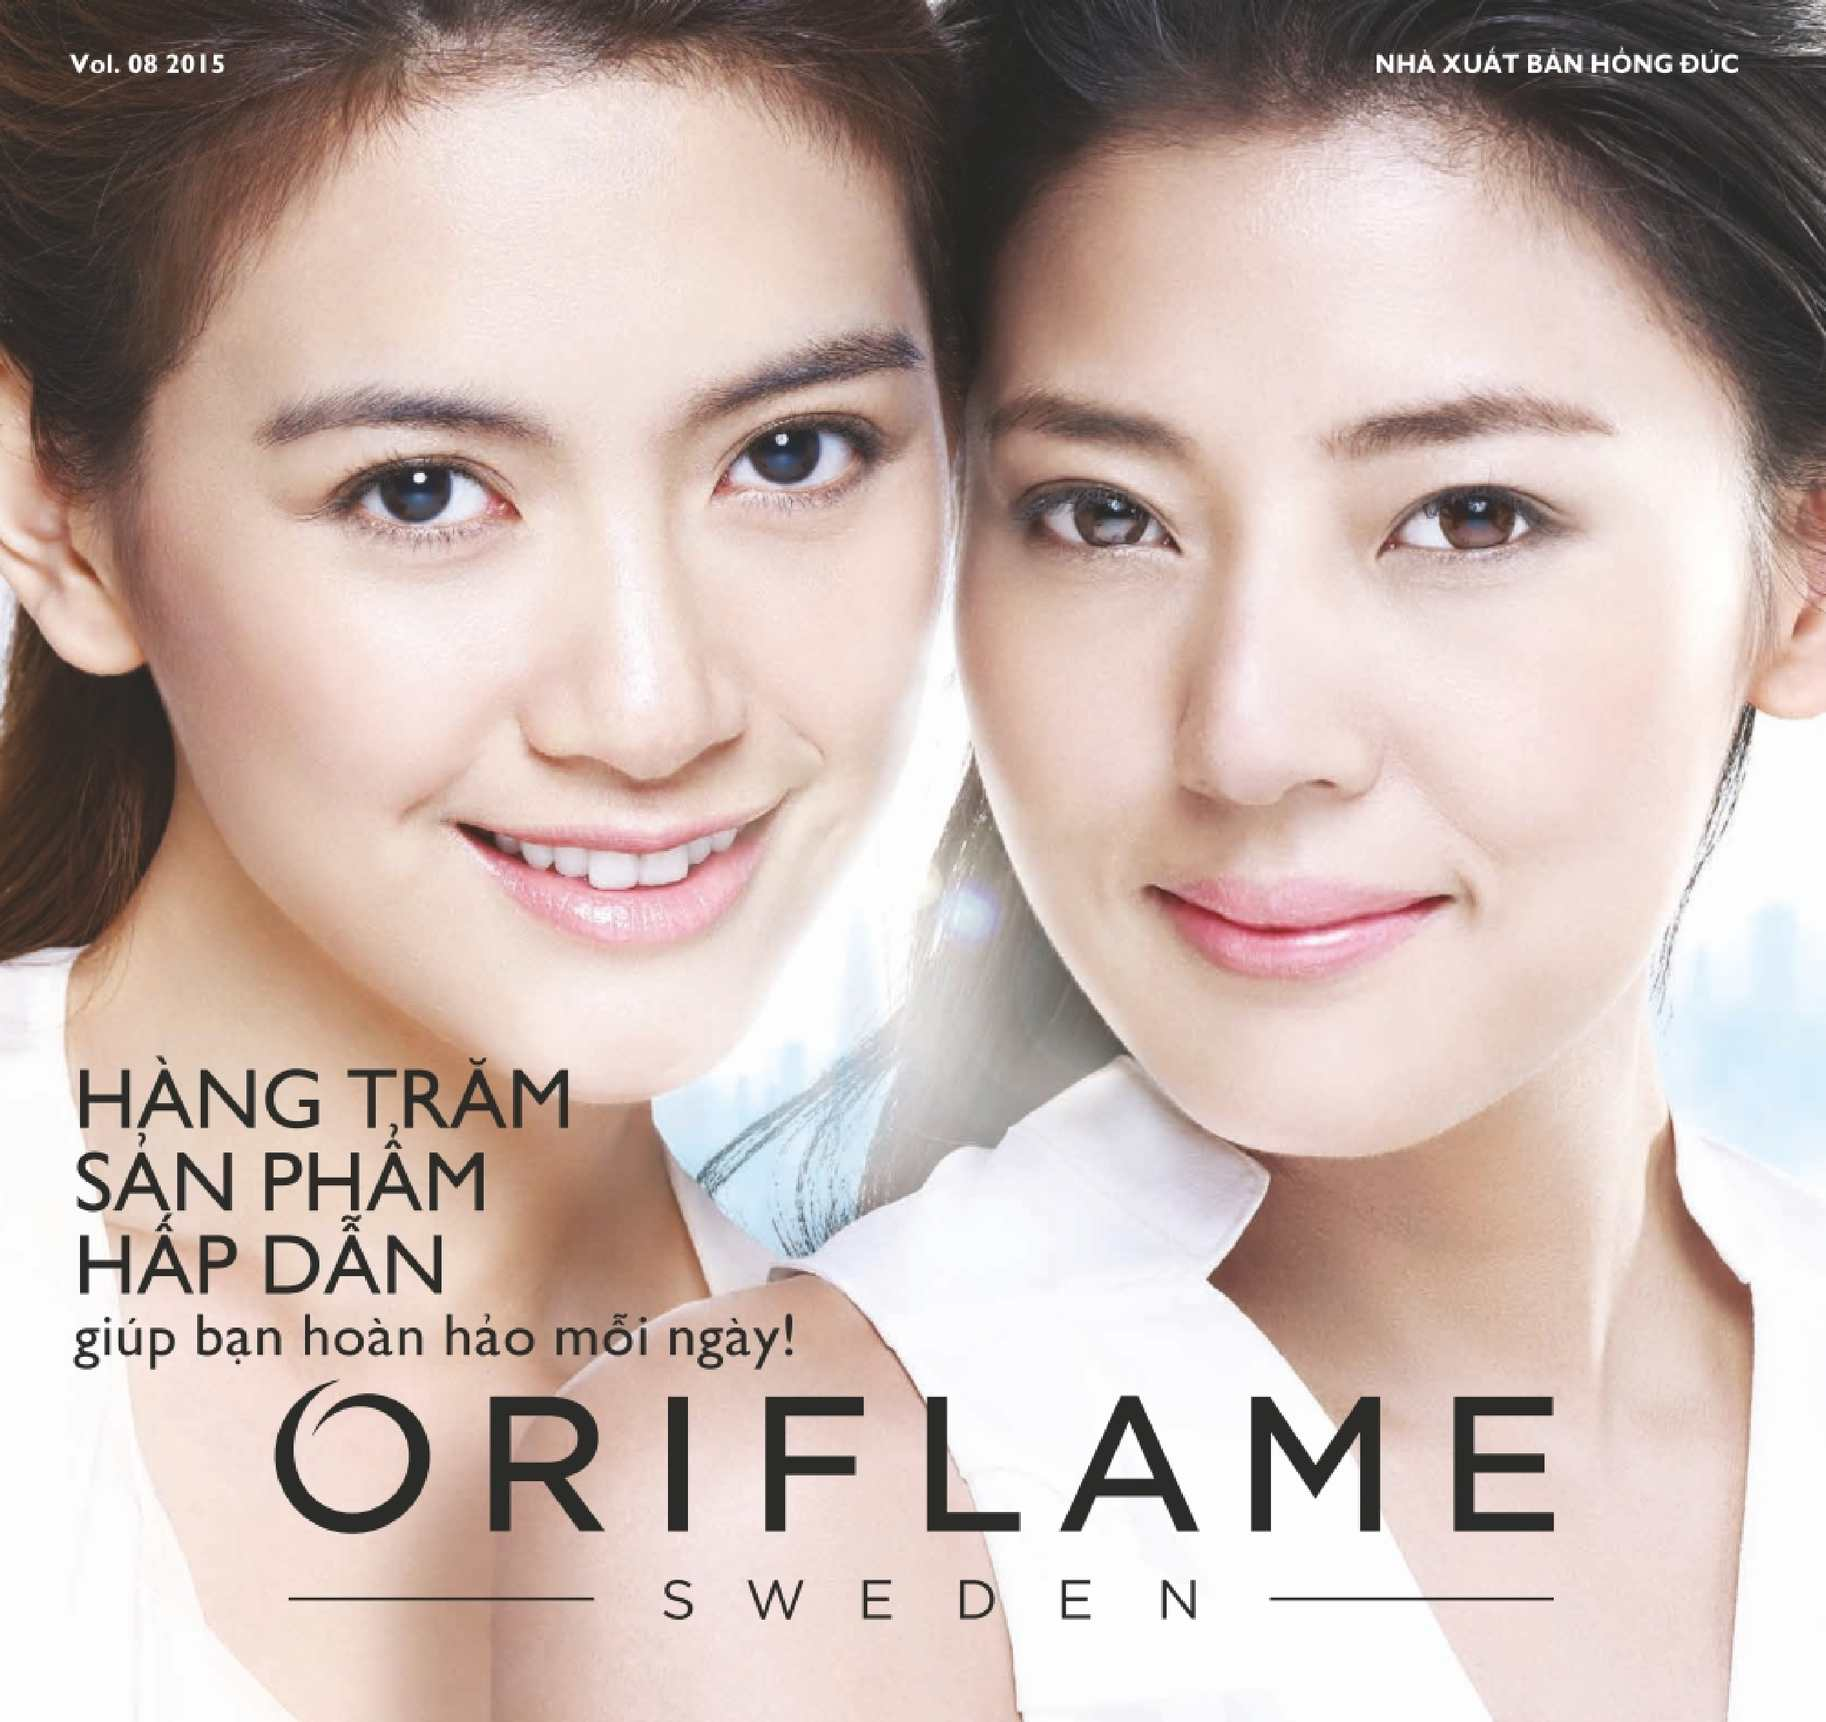 Catalogue My Pham Oriflame 8-2015